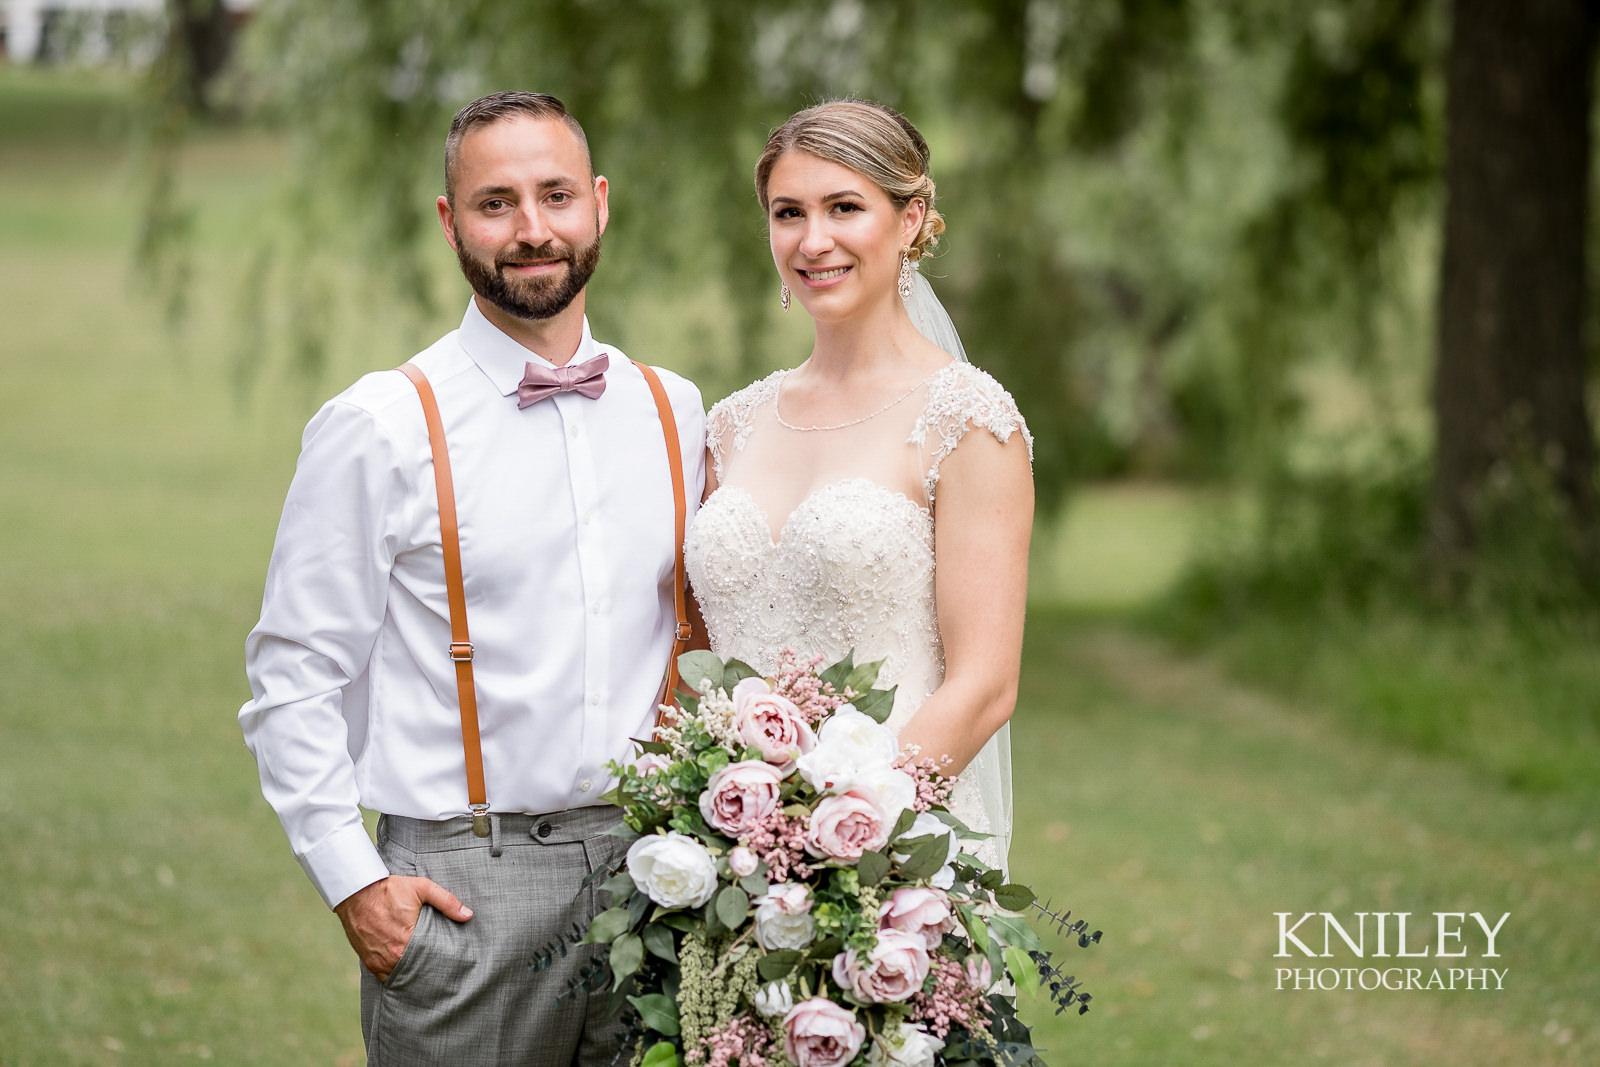 062 - Ontario Golf Club Wedding Pictures - XT2B8611.jpg